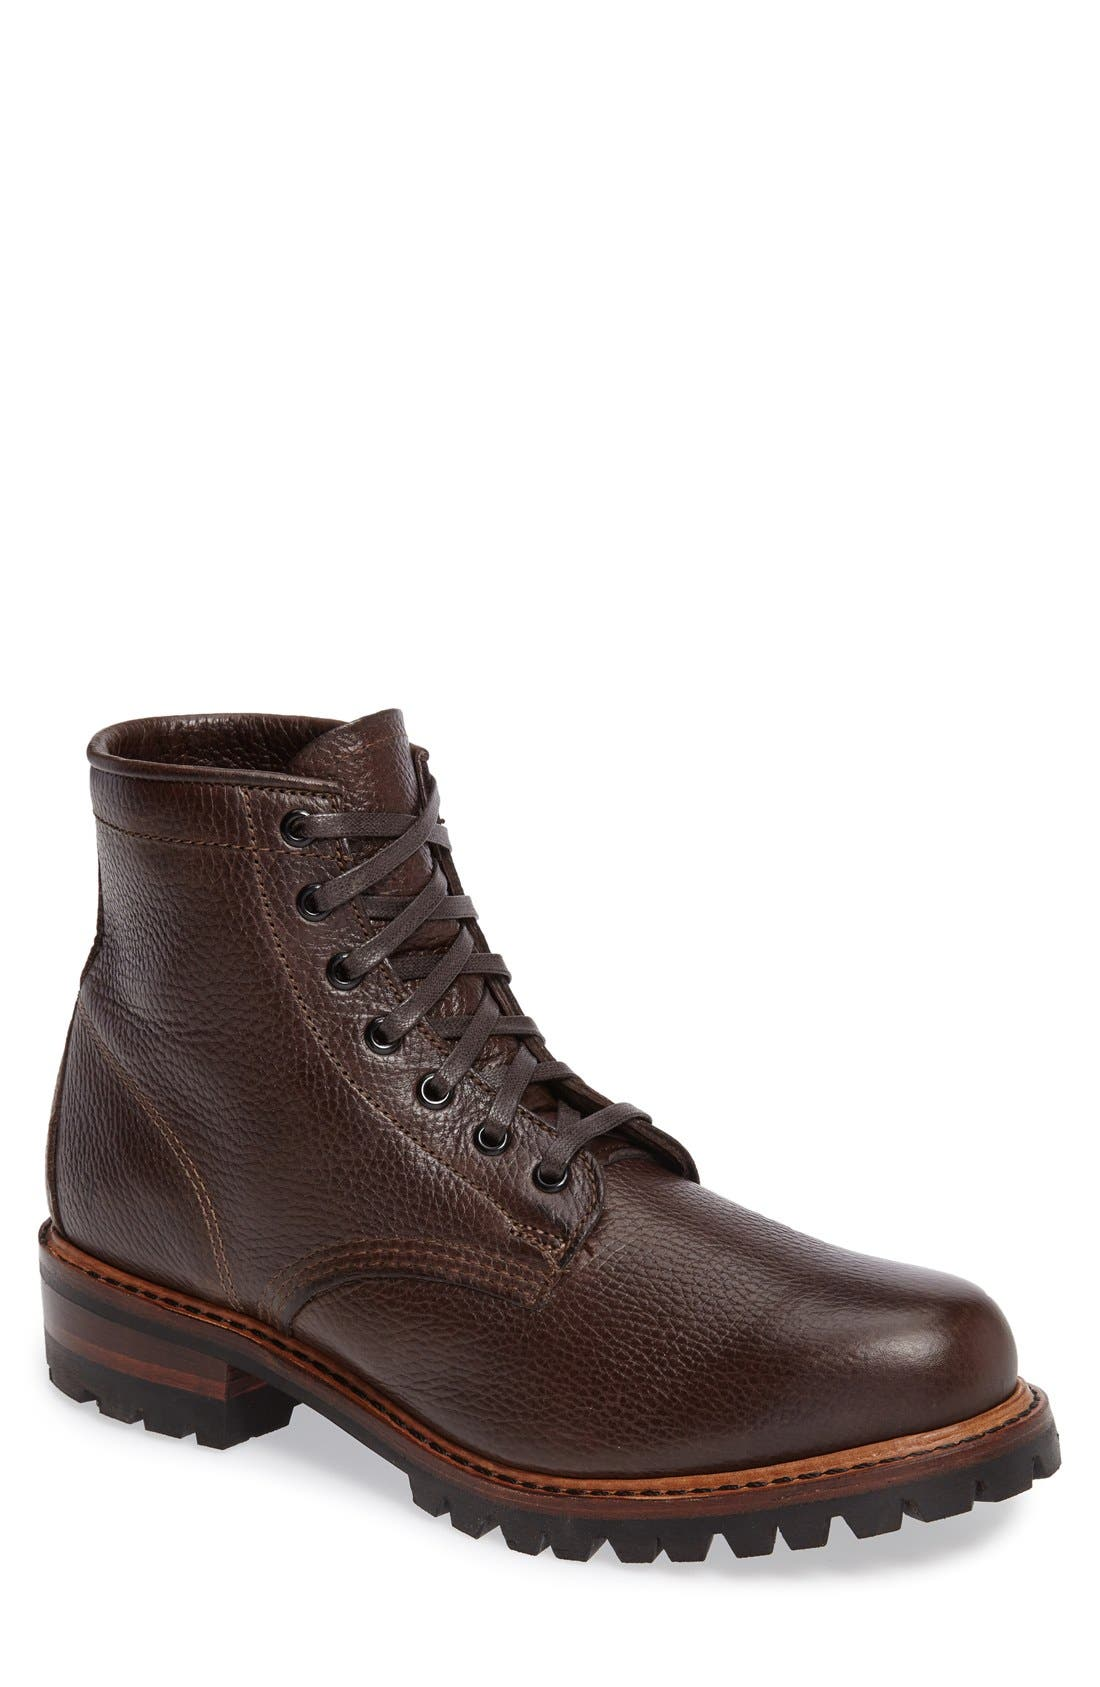 Arkansas Logger Boot,                         Main,                         color, DARK BROWN LEATHER